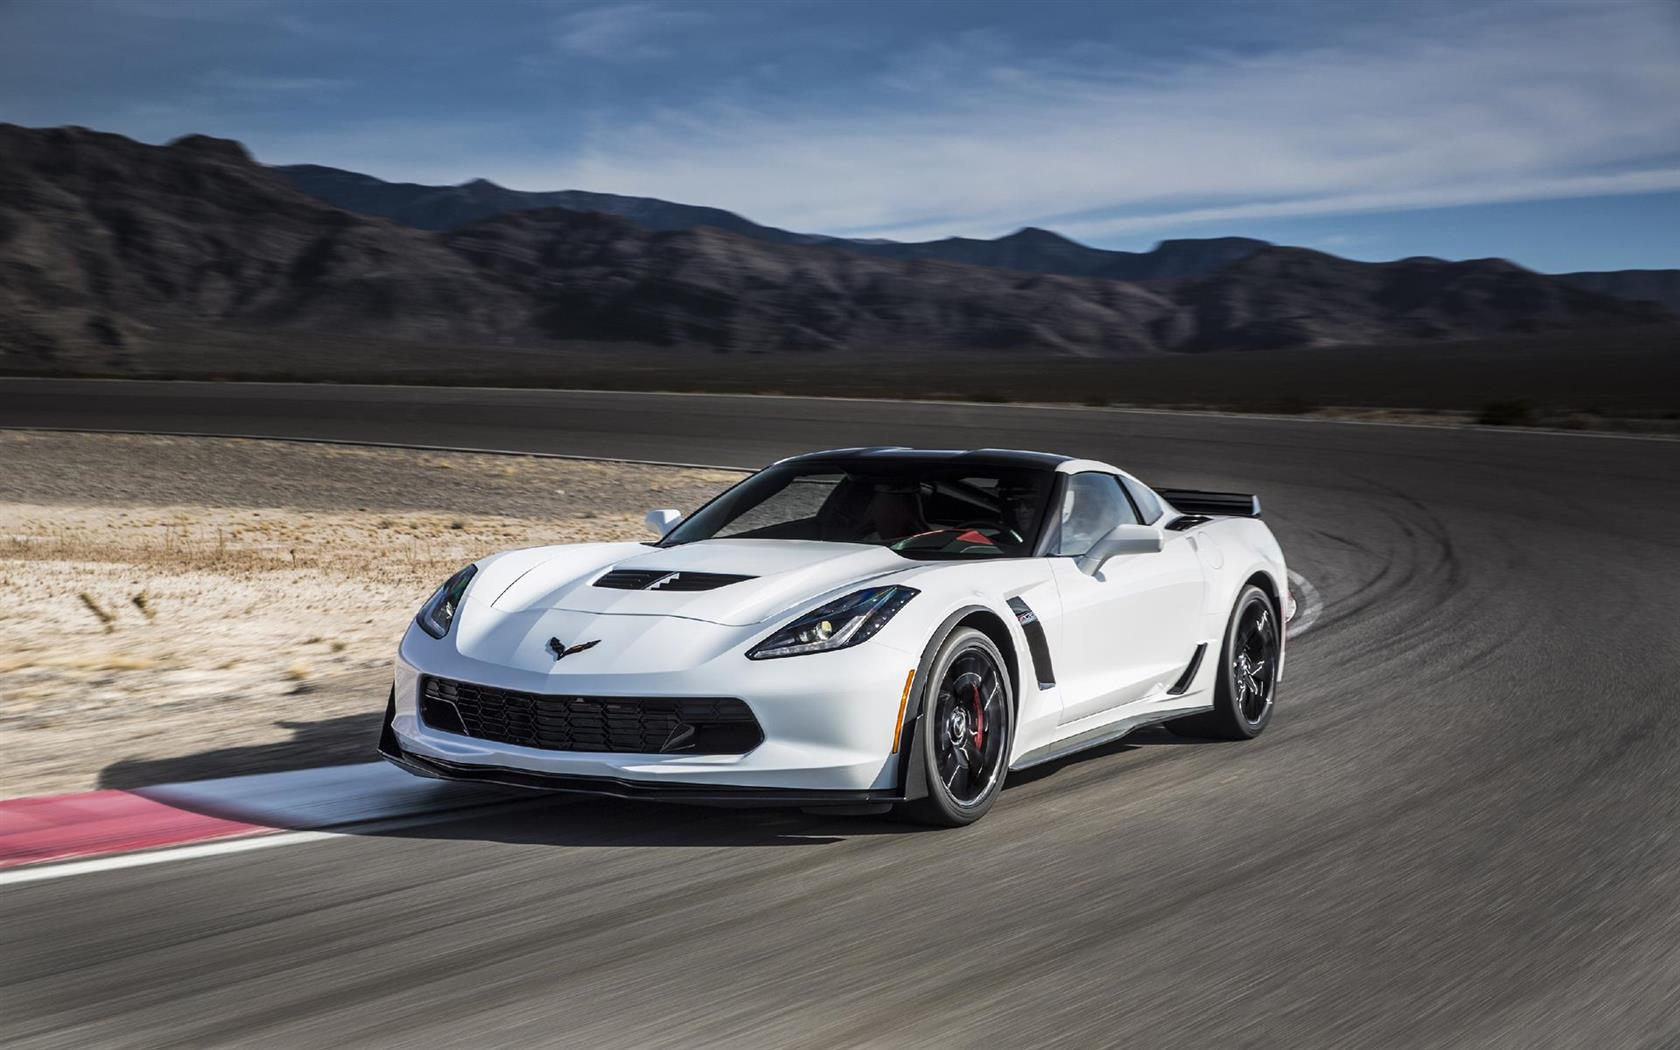 Why Buy a Chevrolet Corvette Z06? - Exotic Car List